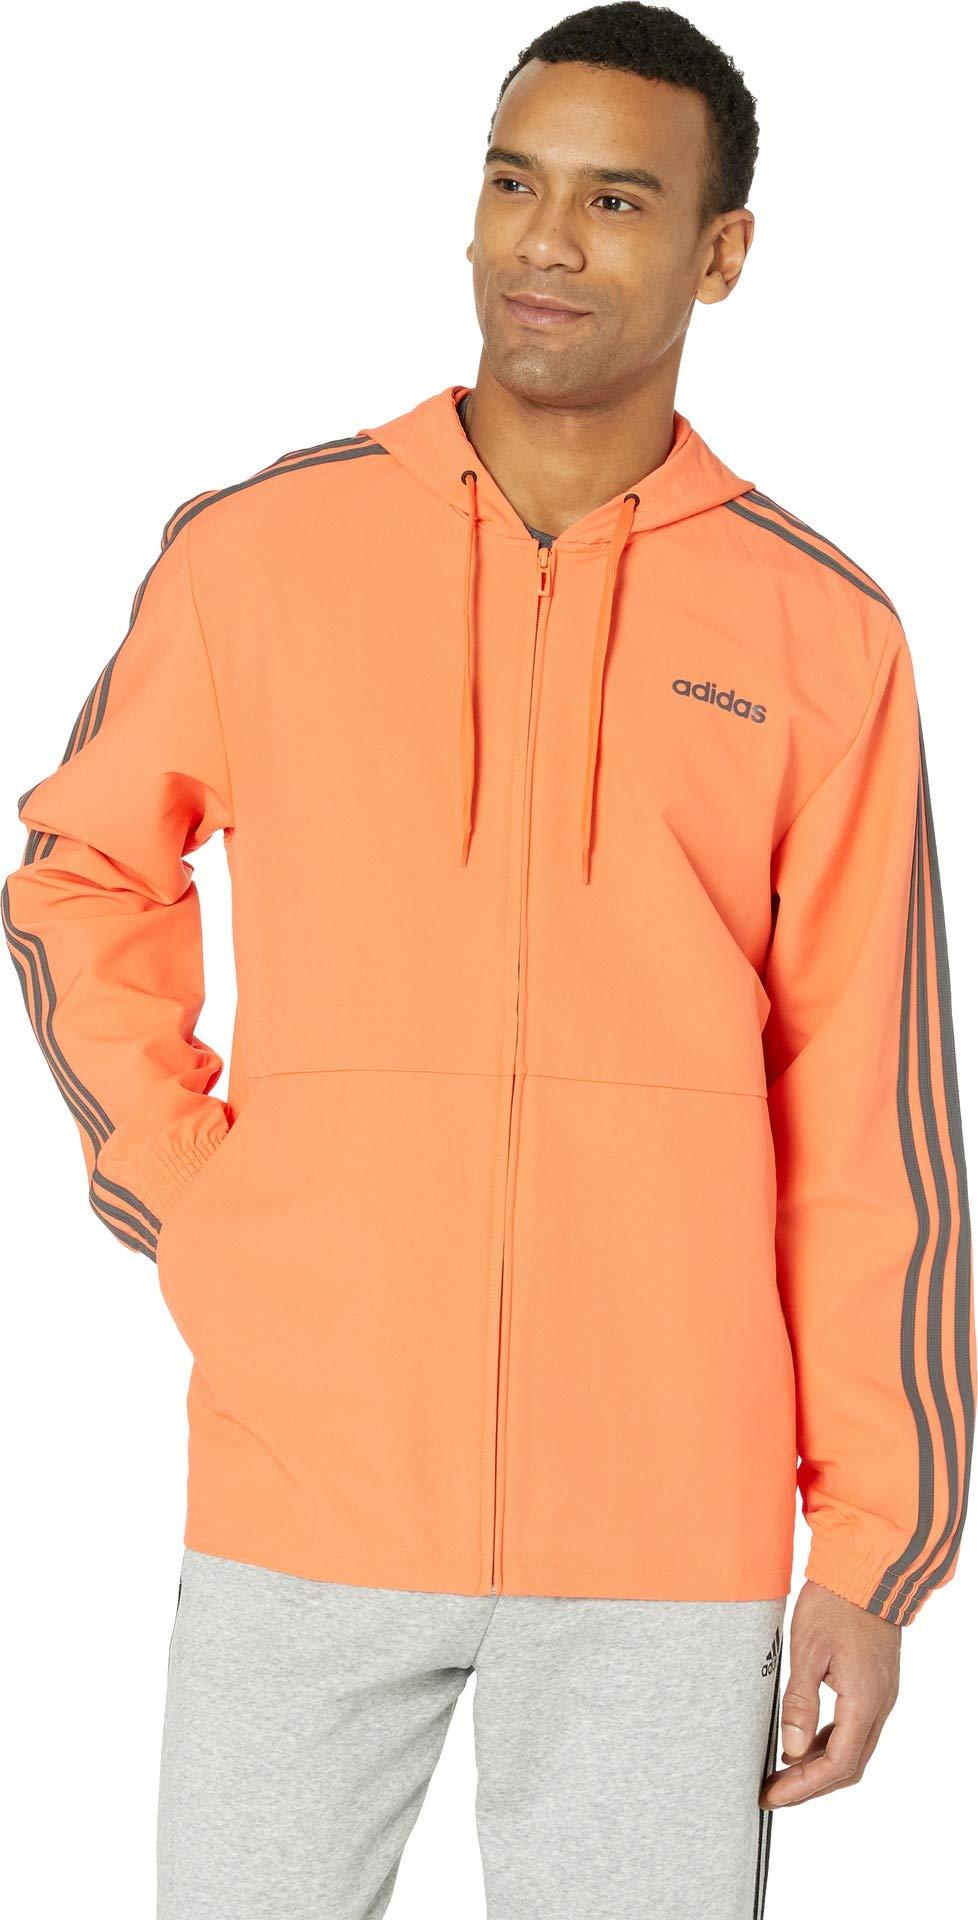 adidas Men's Essentials 3-Stripes Woven Windbreaker, True Orange, Medium by adidas